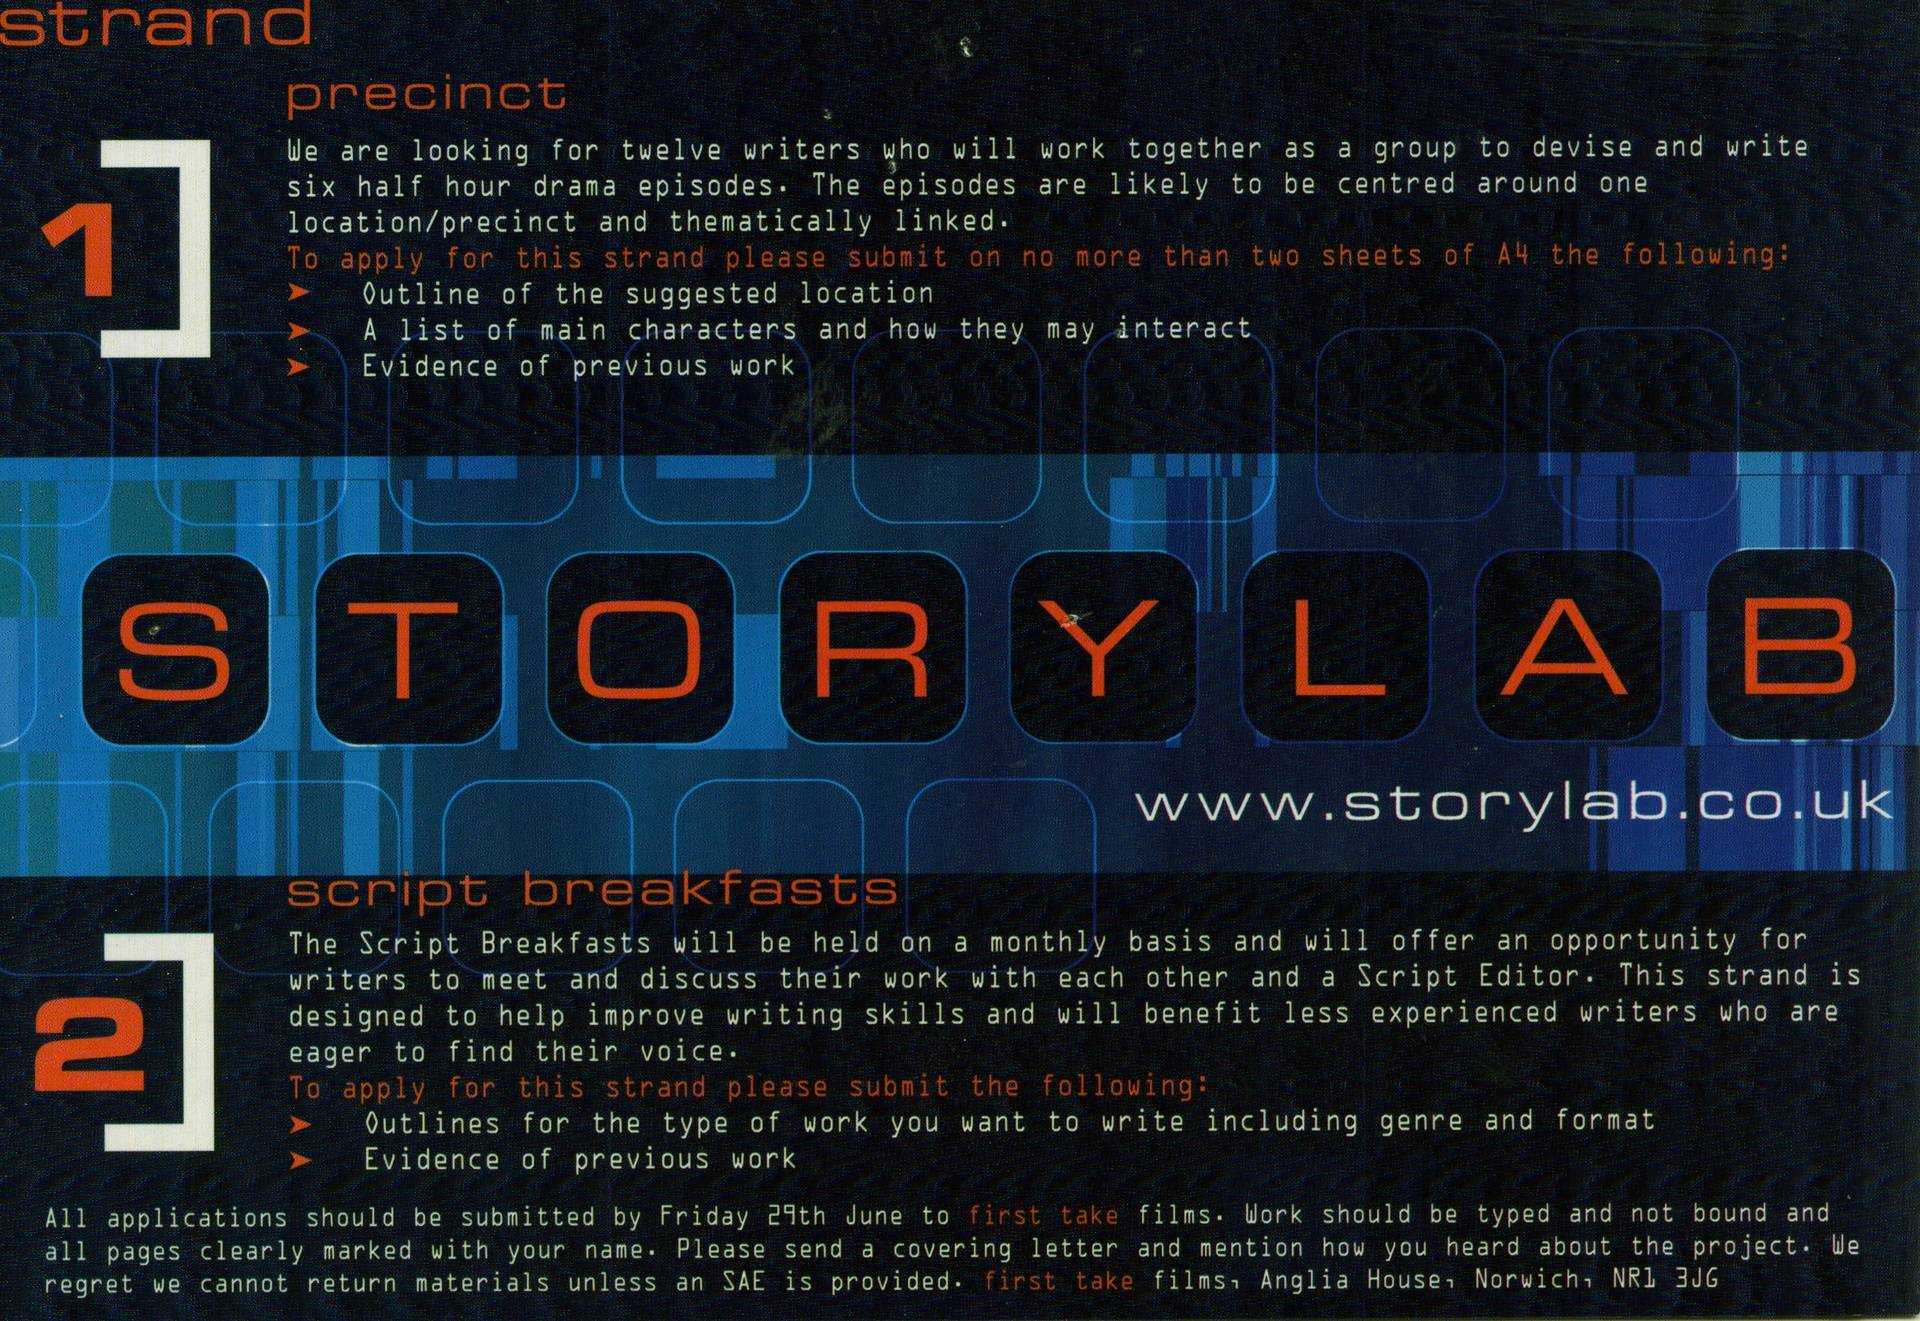 Storylab Script Breakfasts